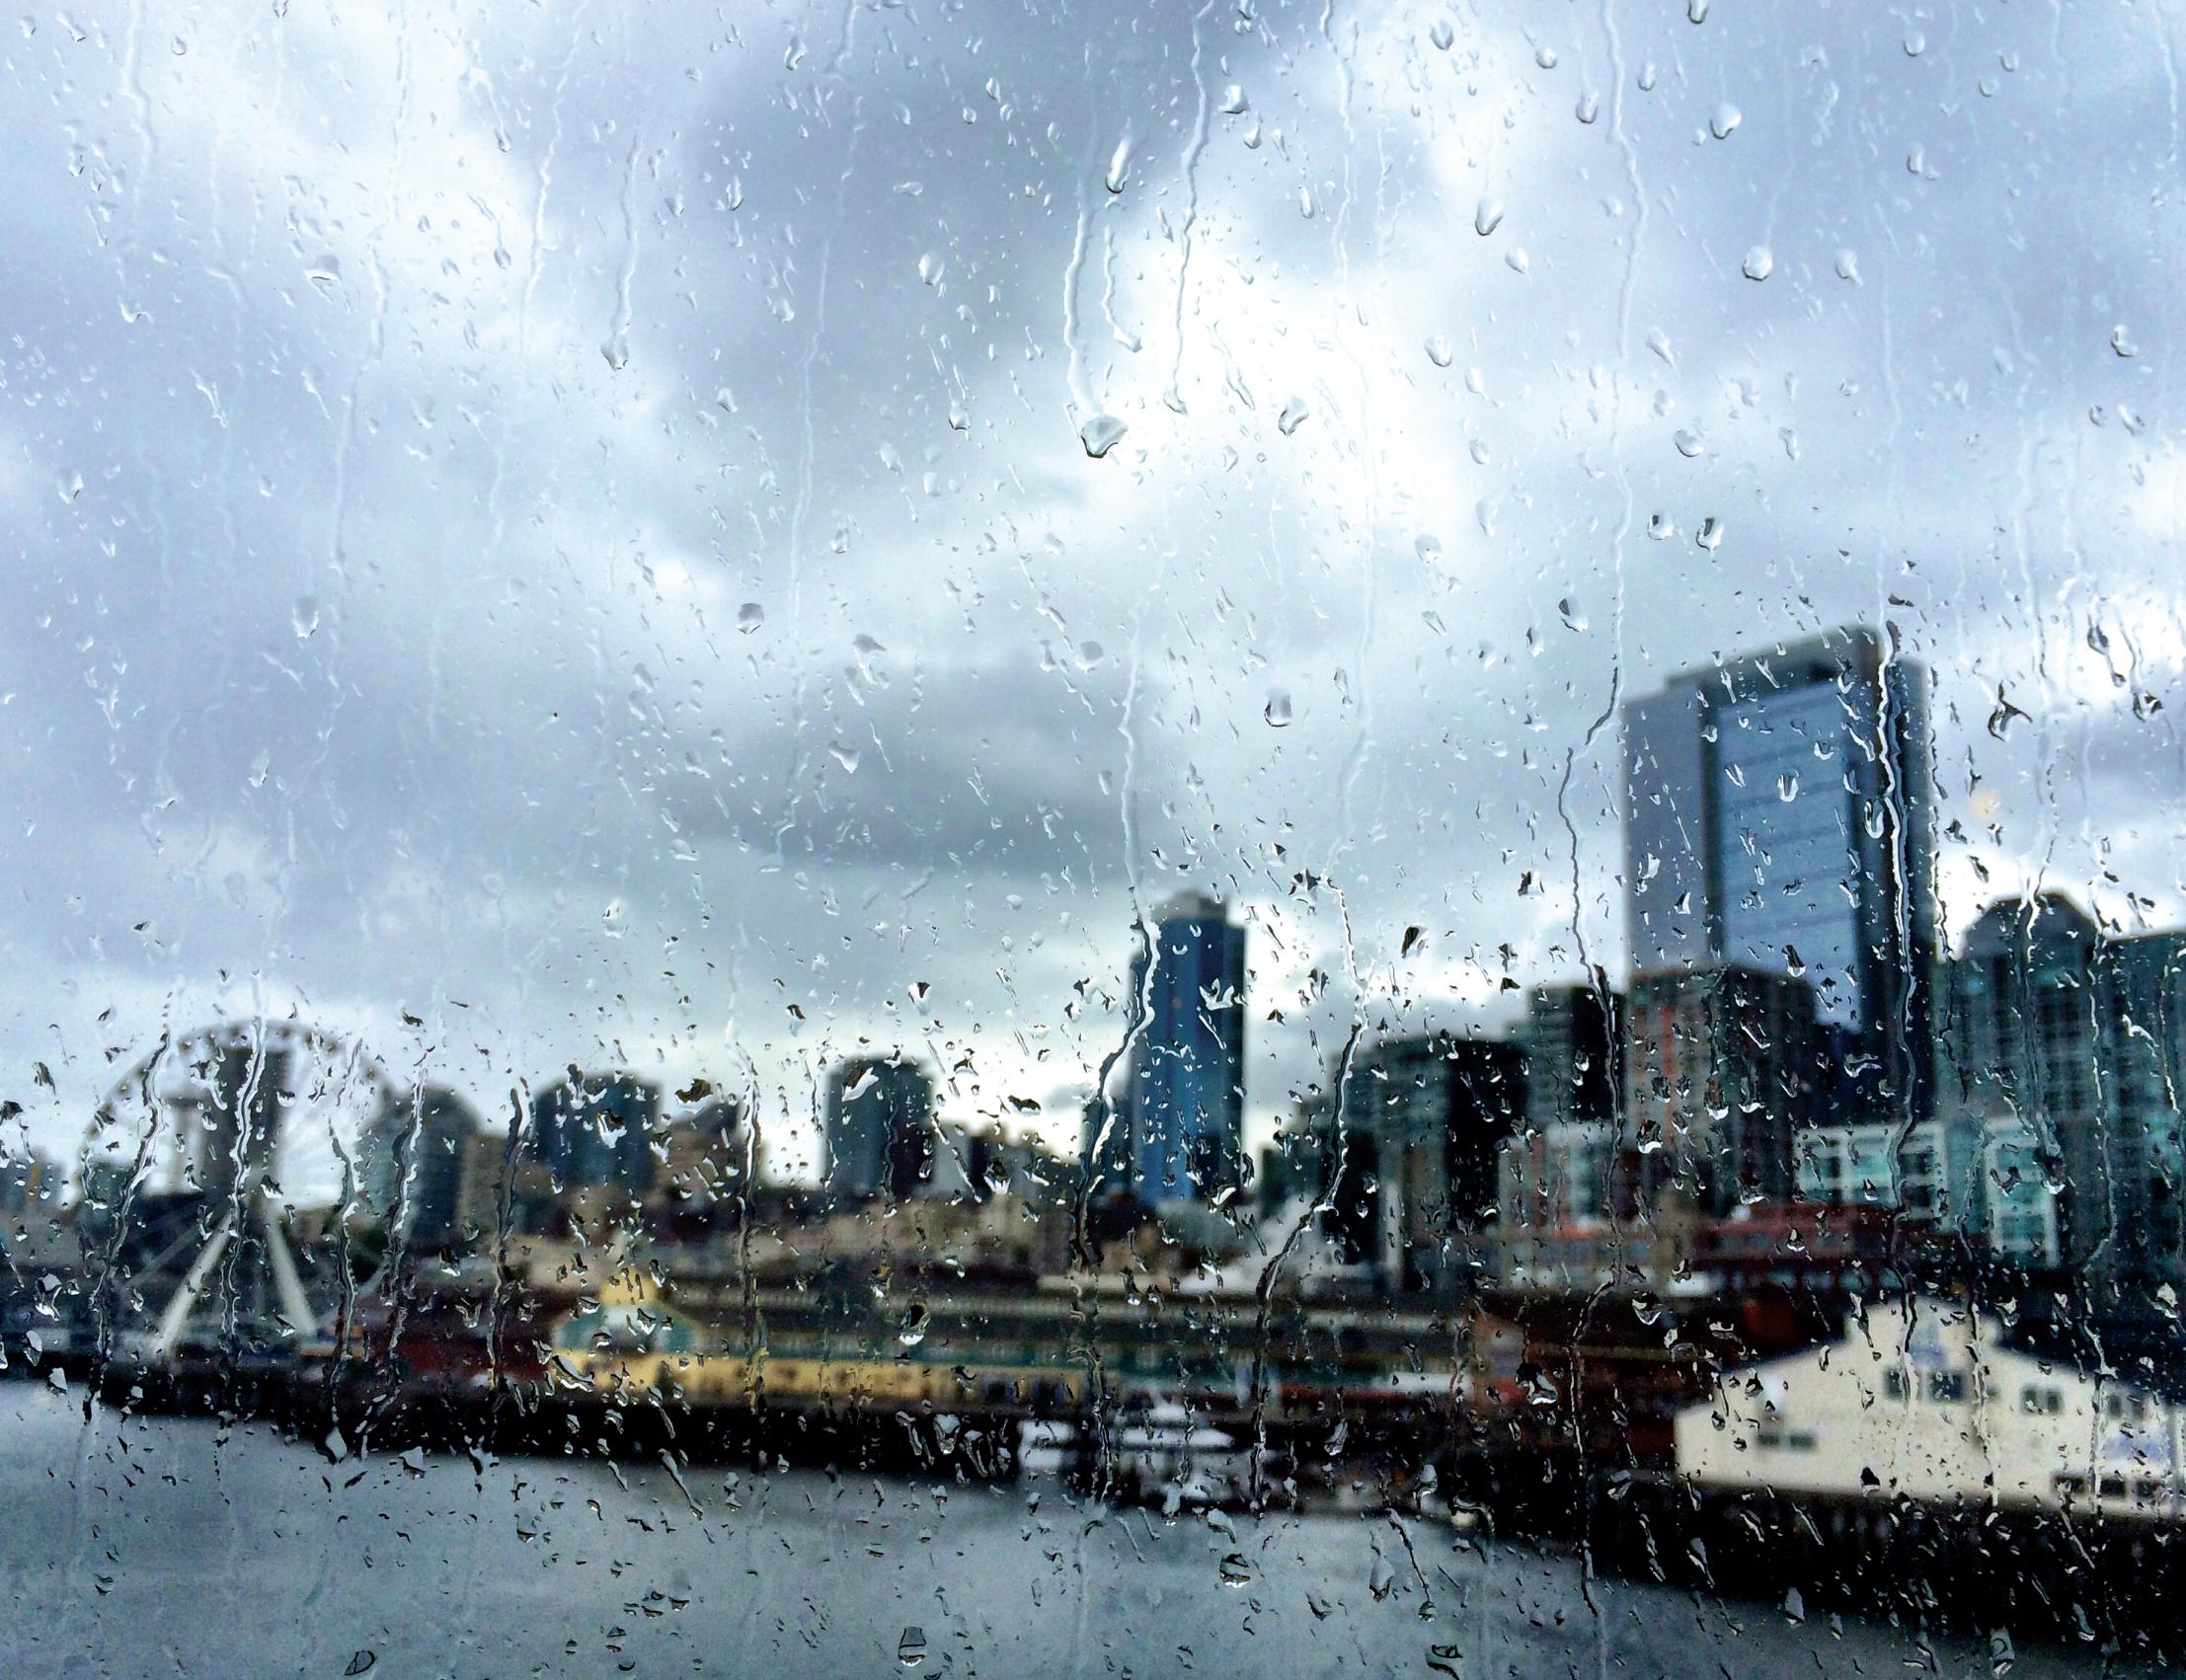 Rainy Window picture of Seattle